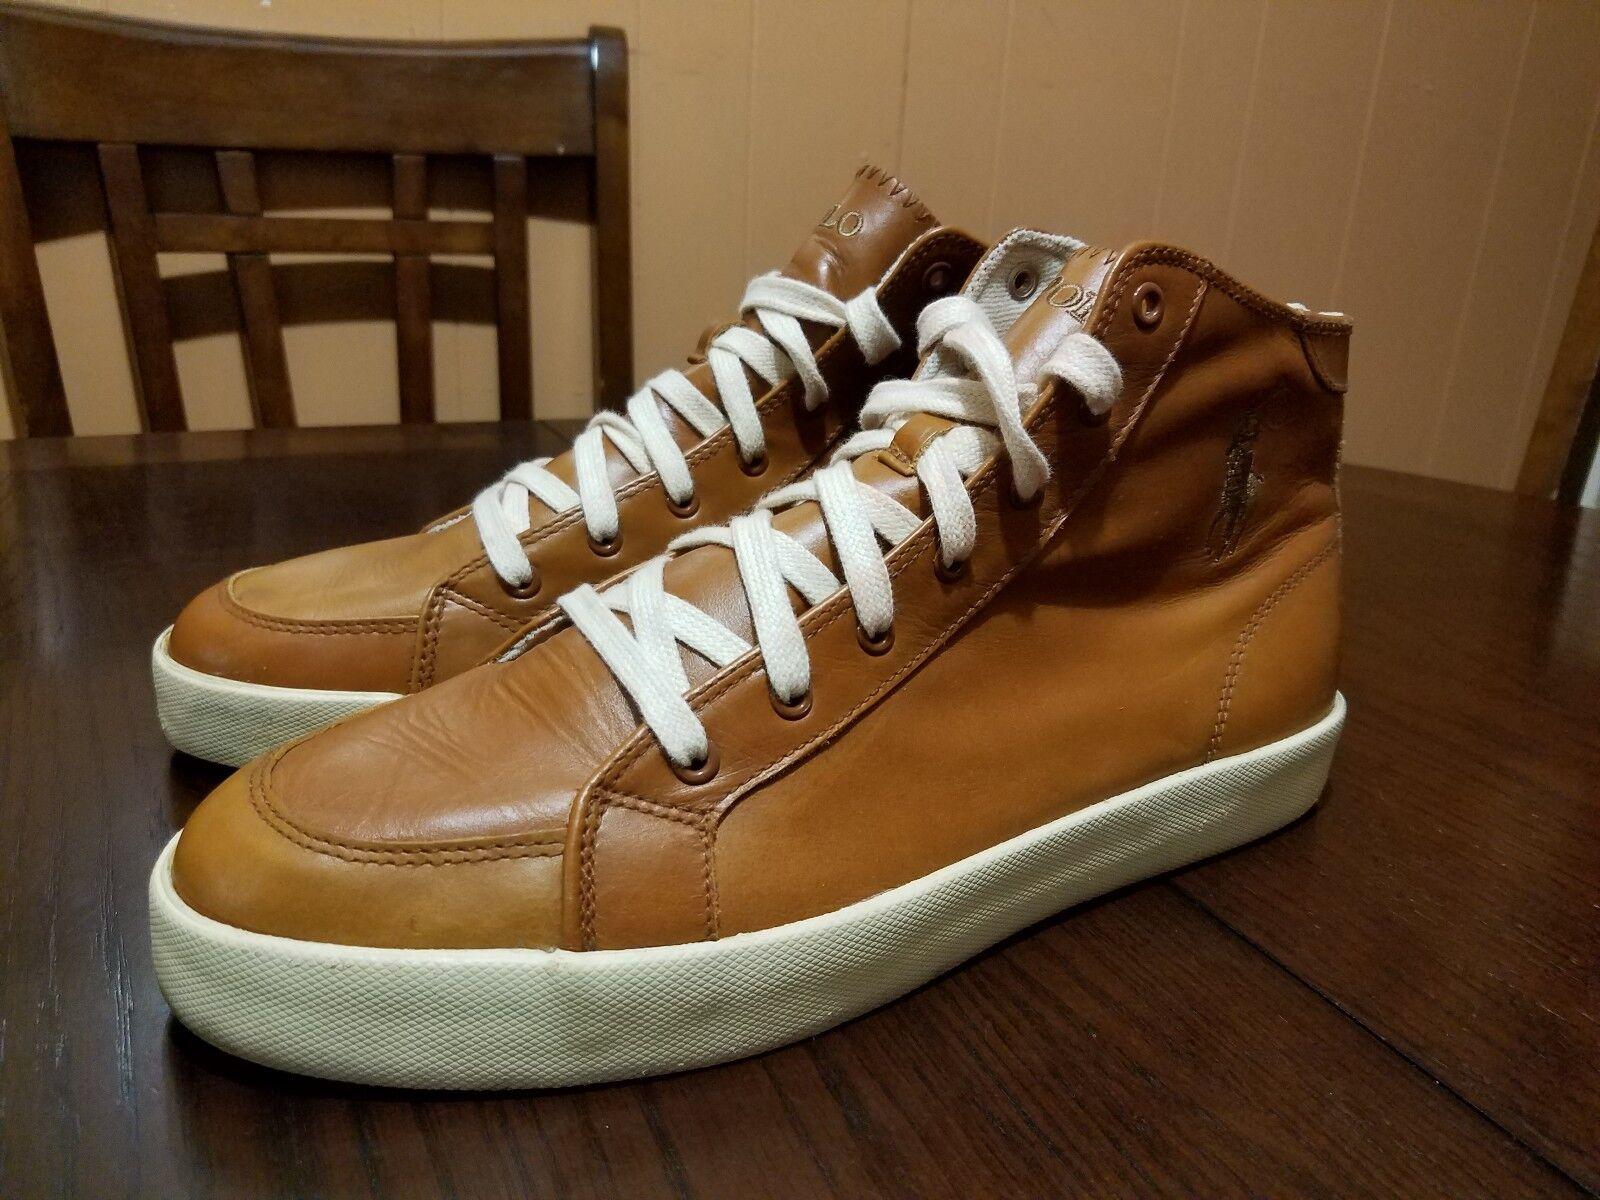 pretty nice 6ea18 13011 Polo Ralph Lauren Marrone Beige Leather Fashion Ankle Ankle ...